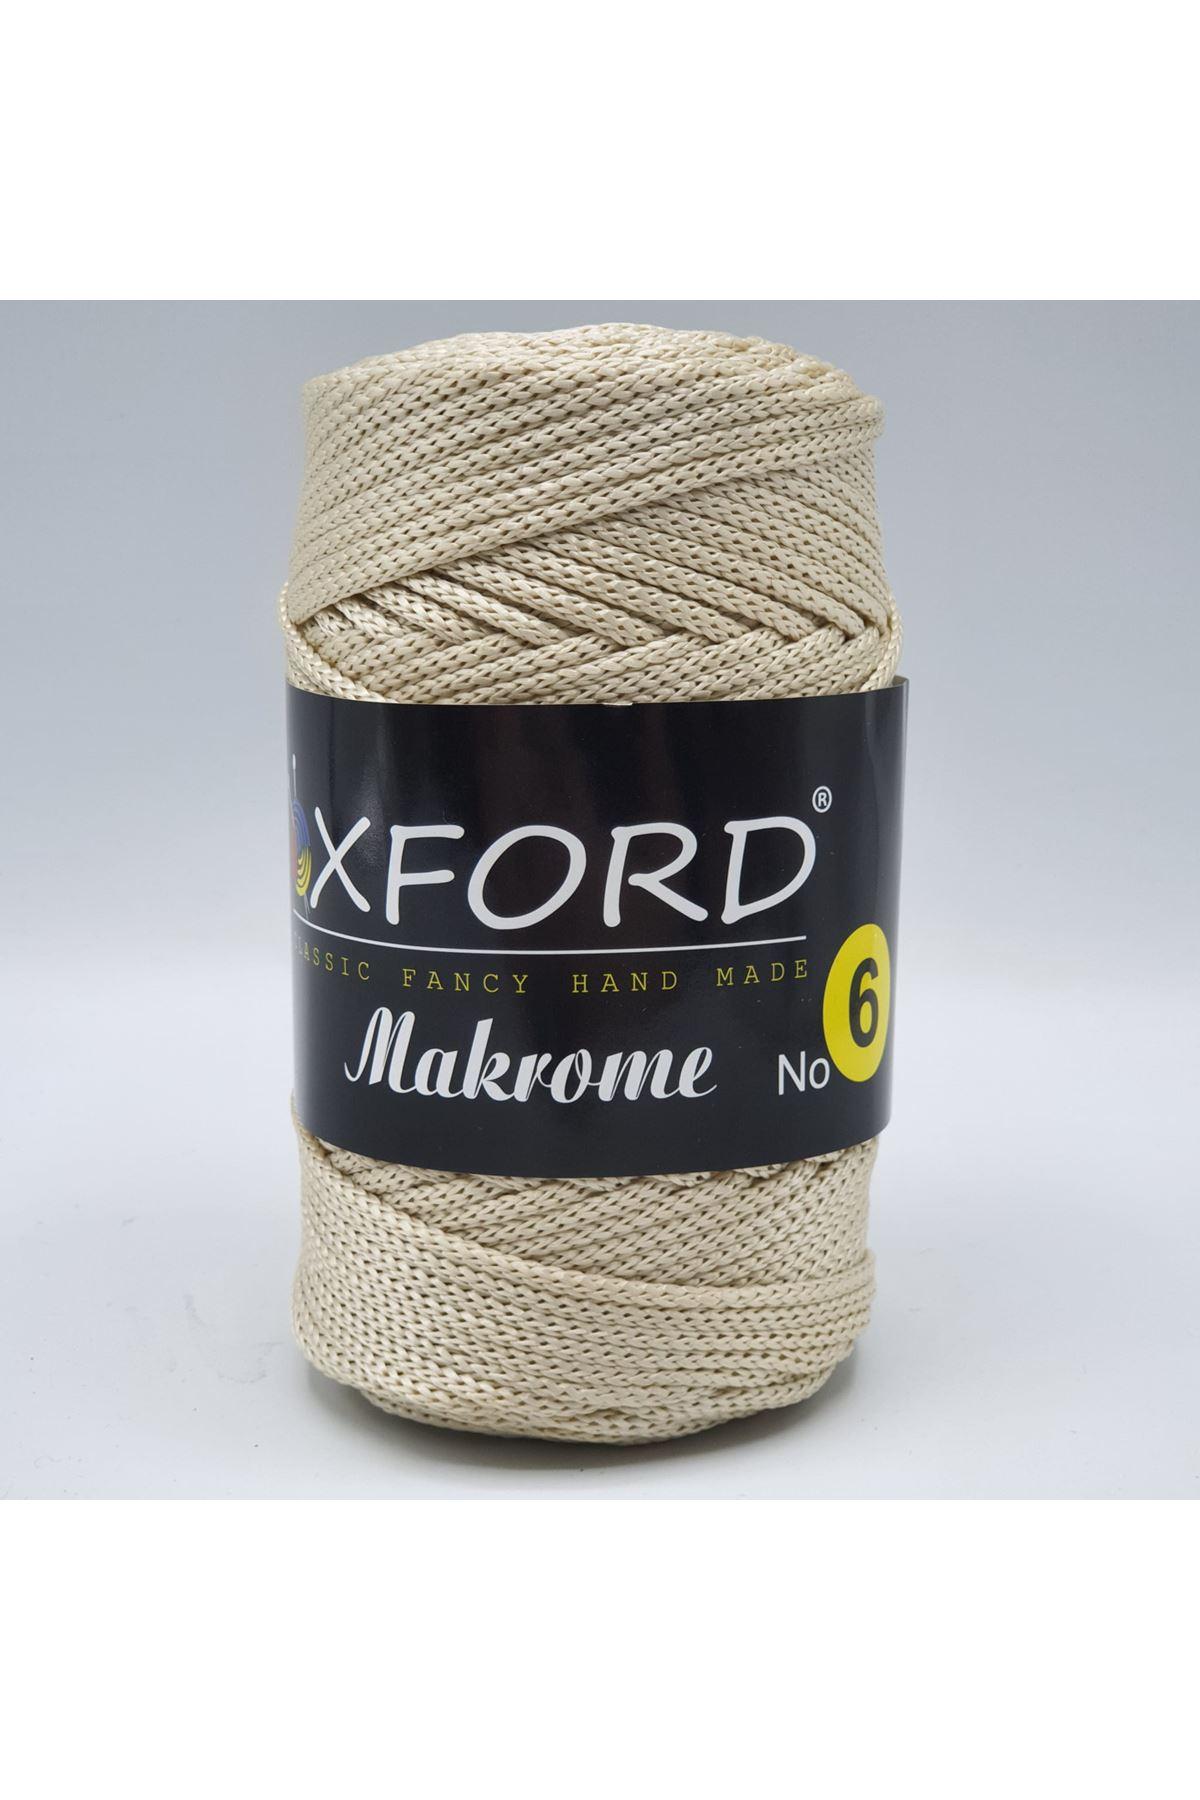 Oxford 6 No Makrome - 119 Açık Kum